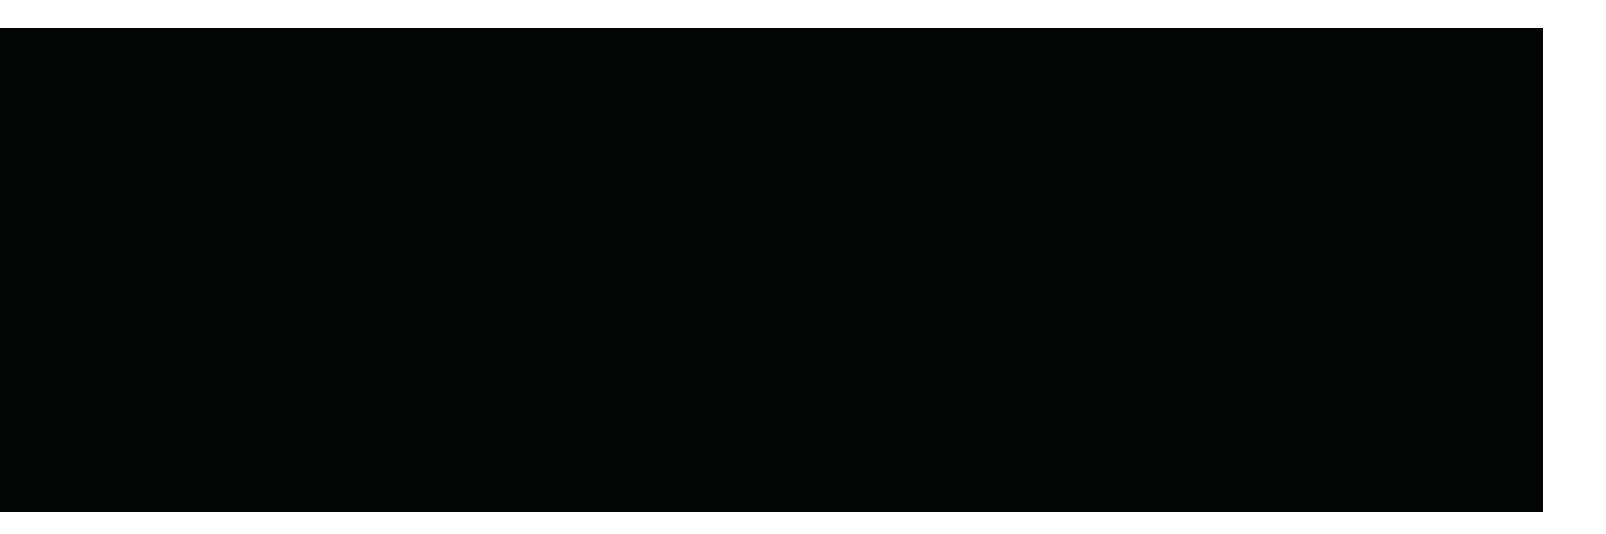 Tempo & Diaframma